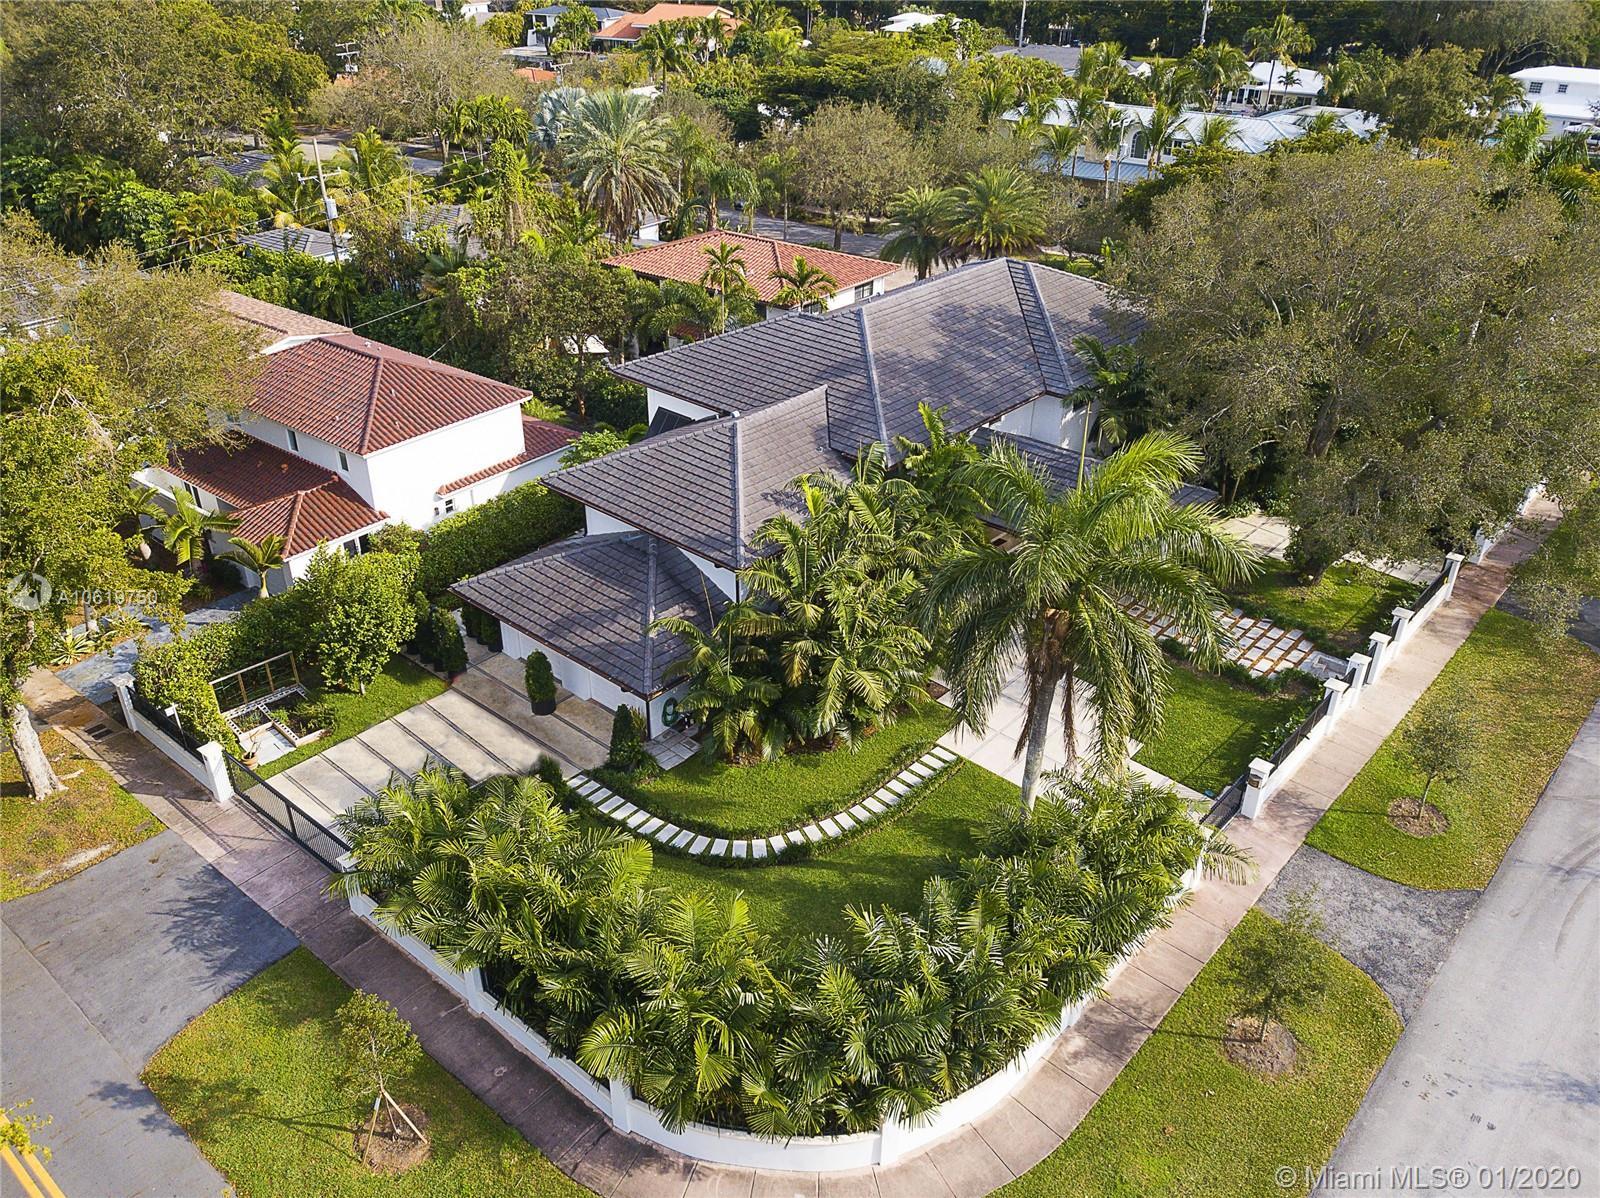 6611 Leonardo St, Coral Gables, FL 33146